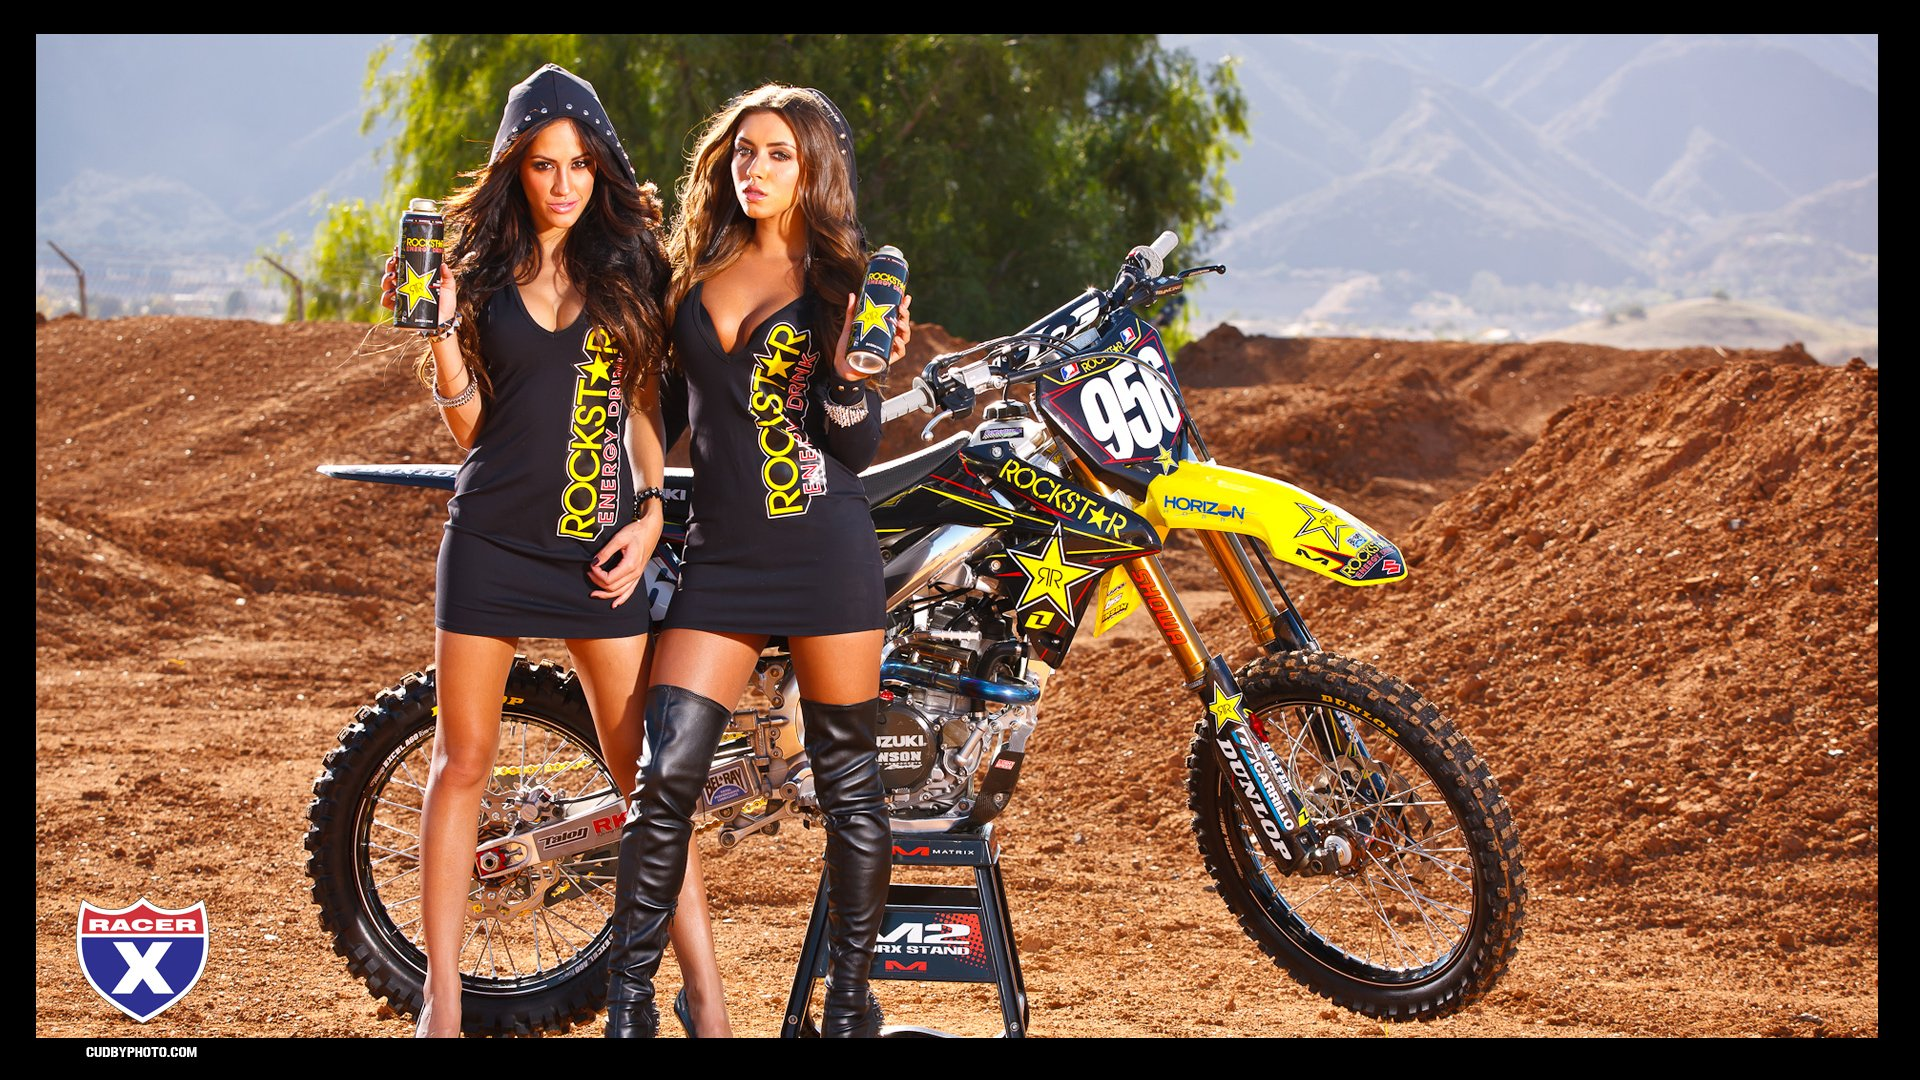 Motocross Wallpaper Girls Rockstar girls 1920x1080